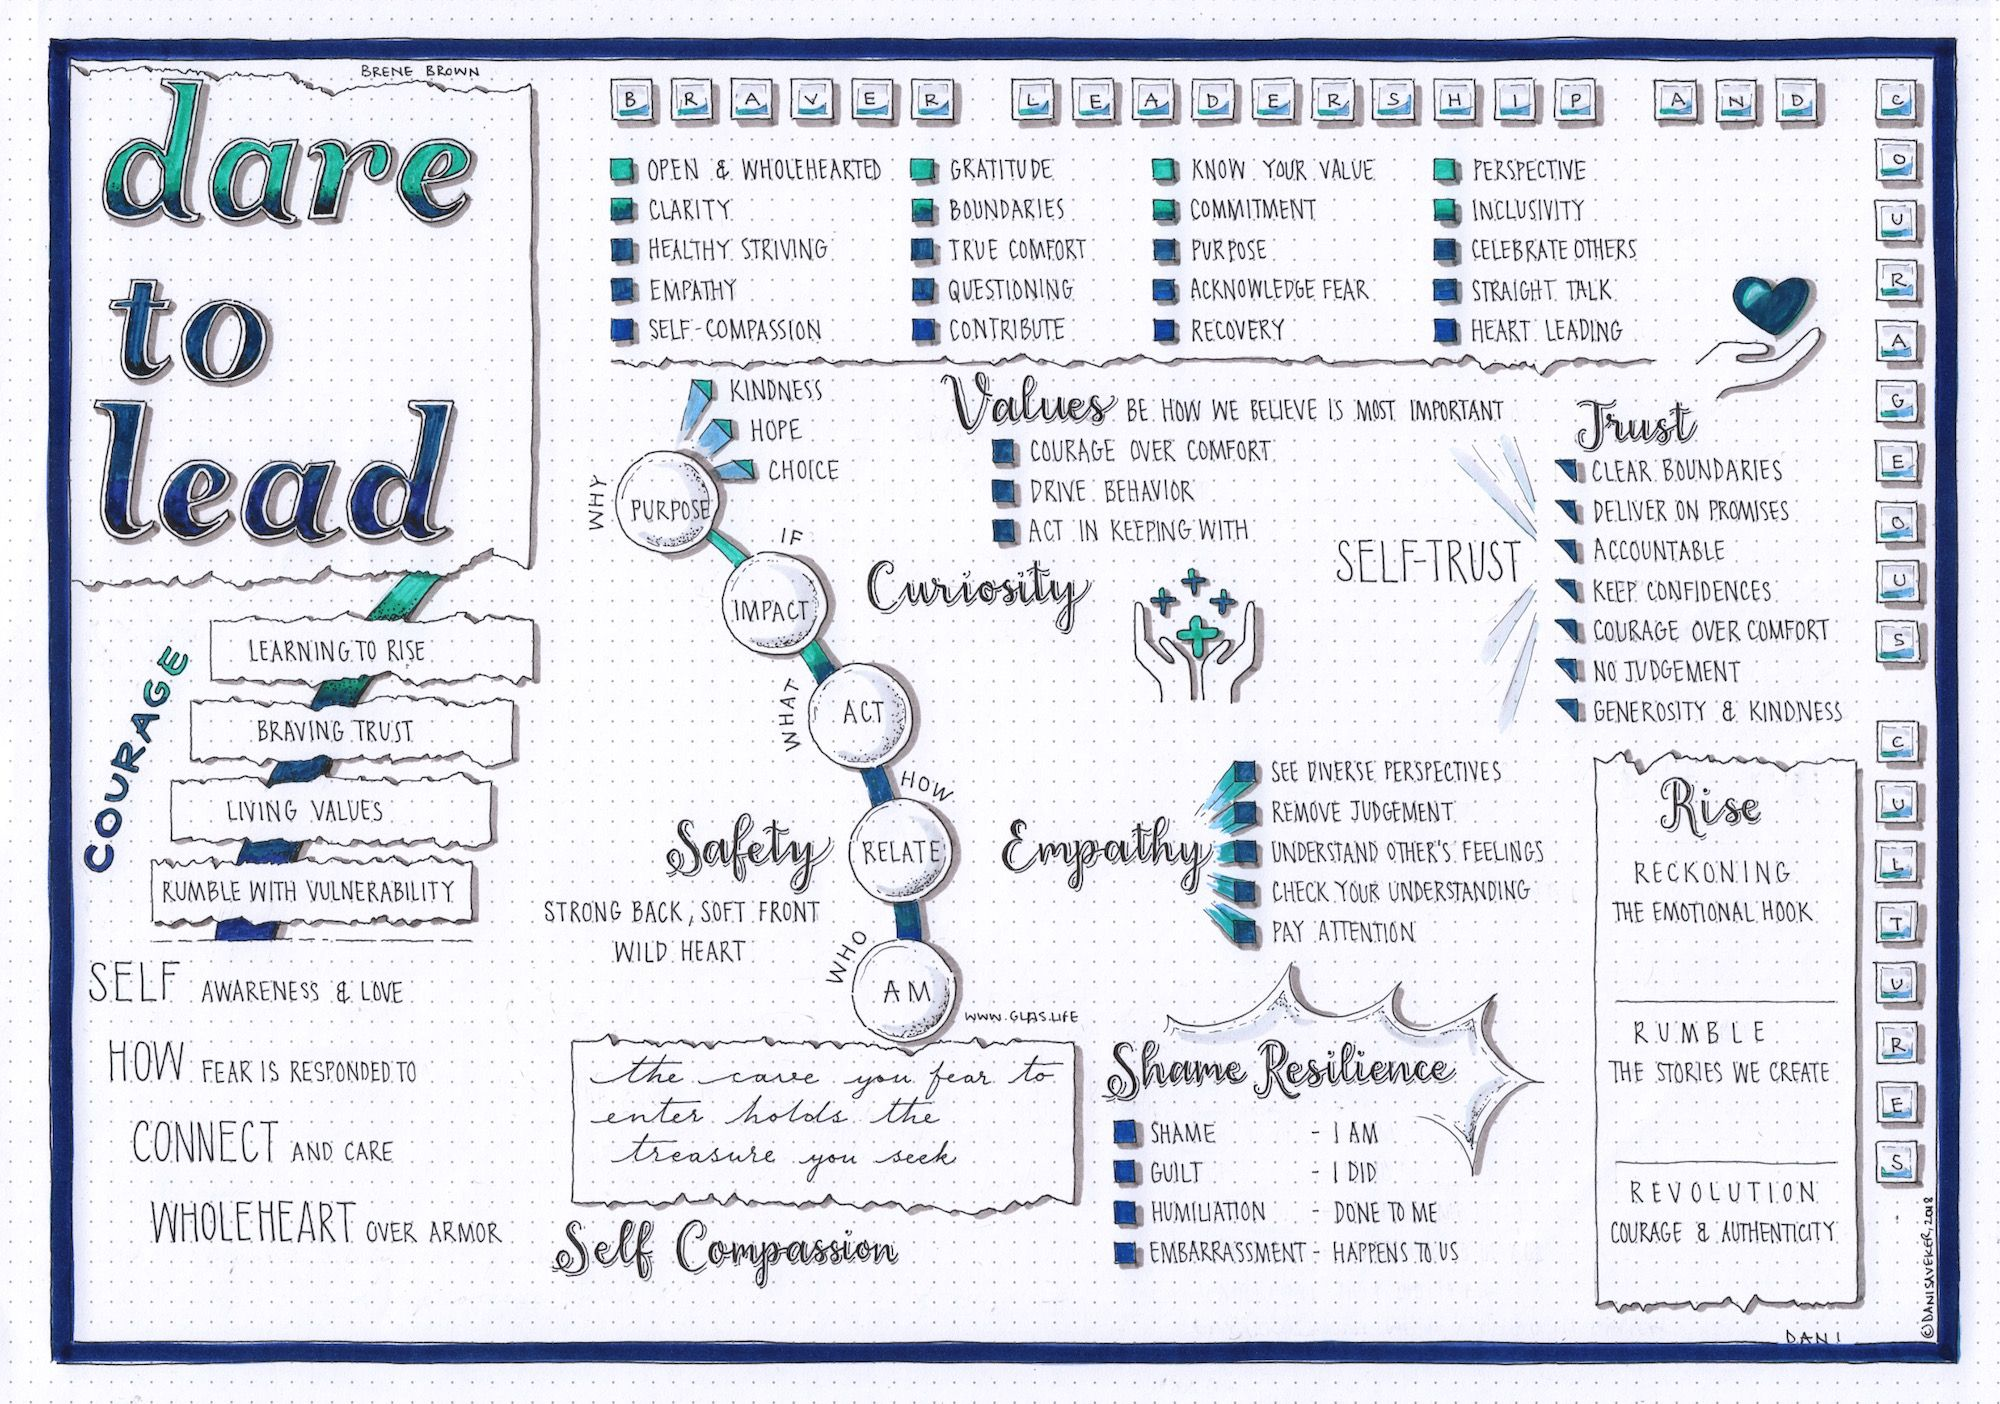 Dare to Lead (Brene Brown) Visual Synopsis by Dani Saveker — Visual Synopsis